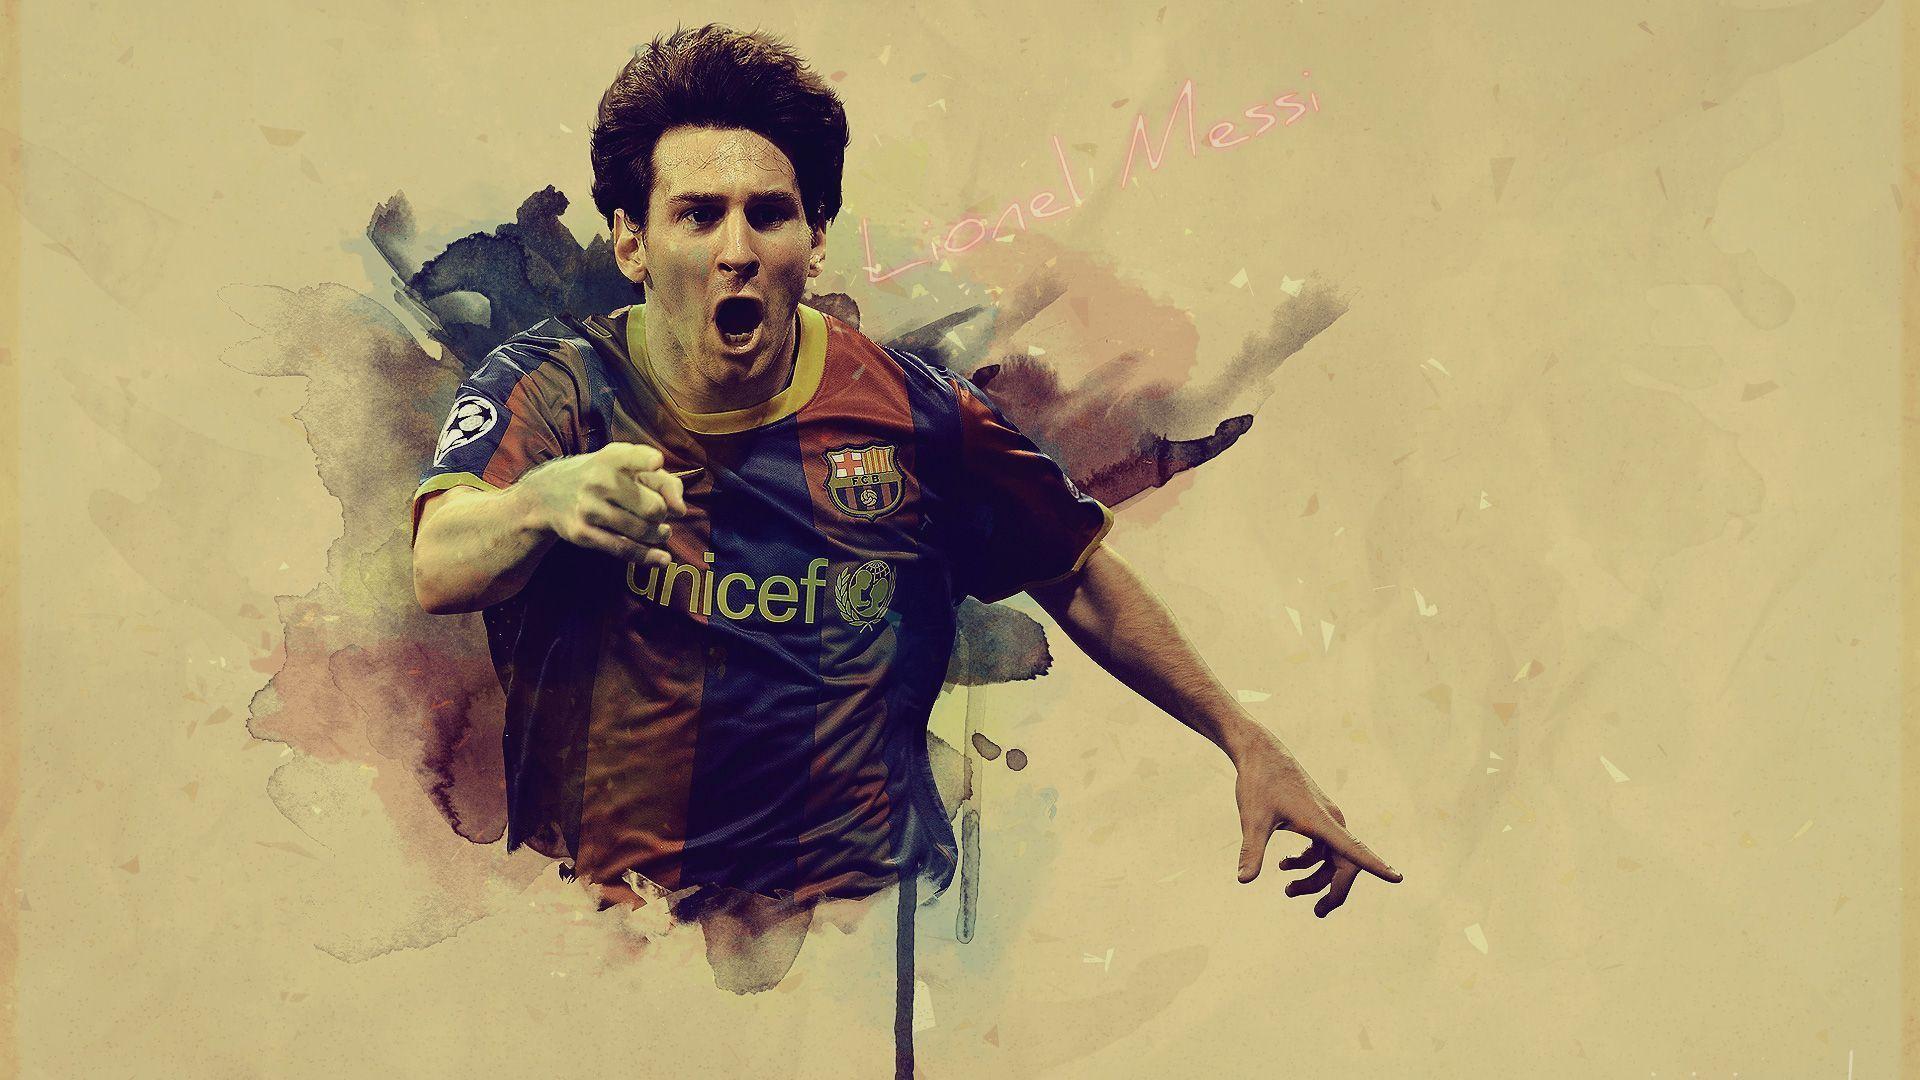 Messi Address Barcelona Background 1 HD Wallpapers | F. C. Barcelona